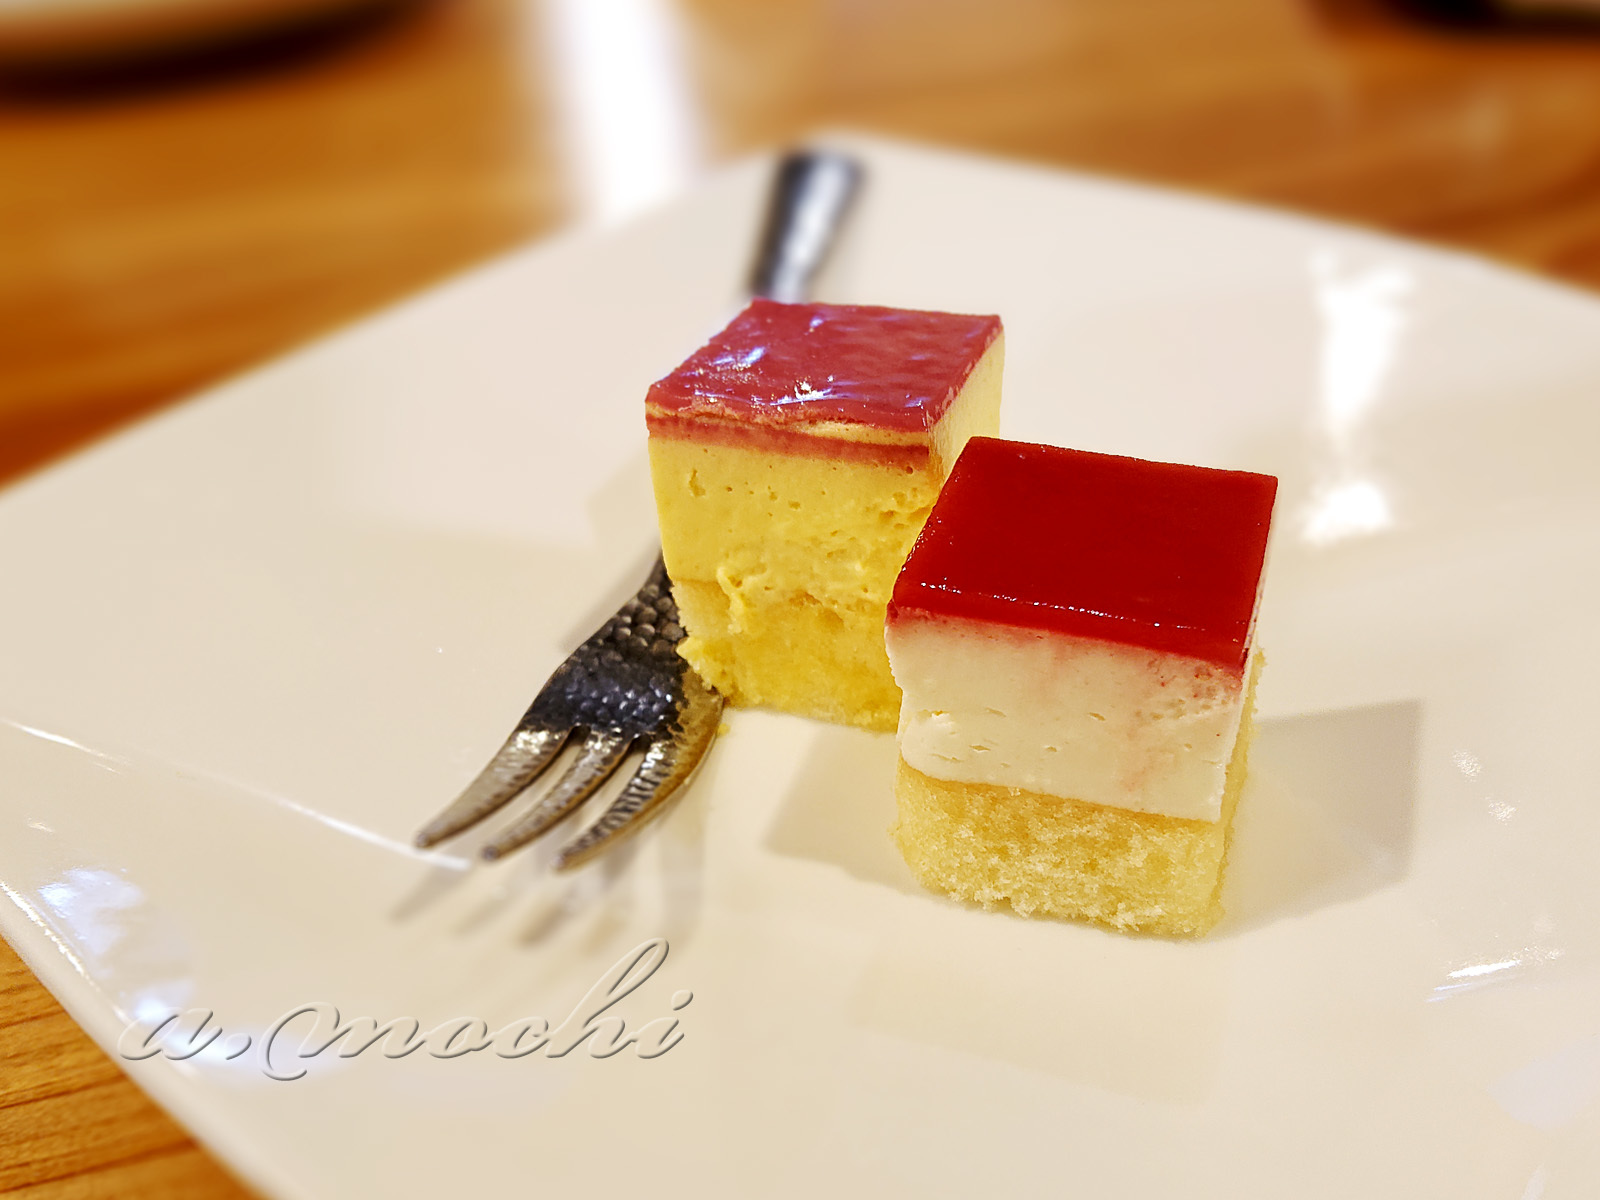 hinata_dessert.jpg